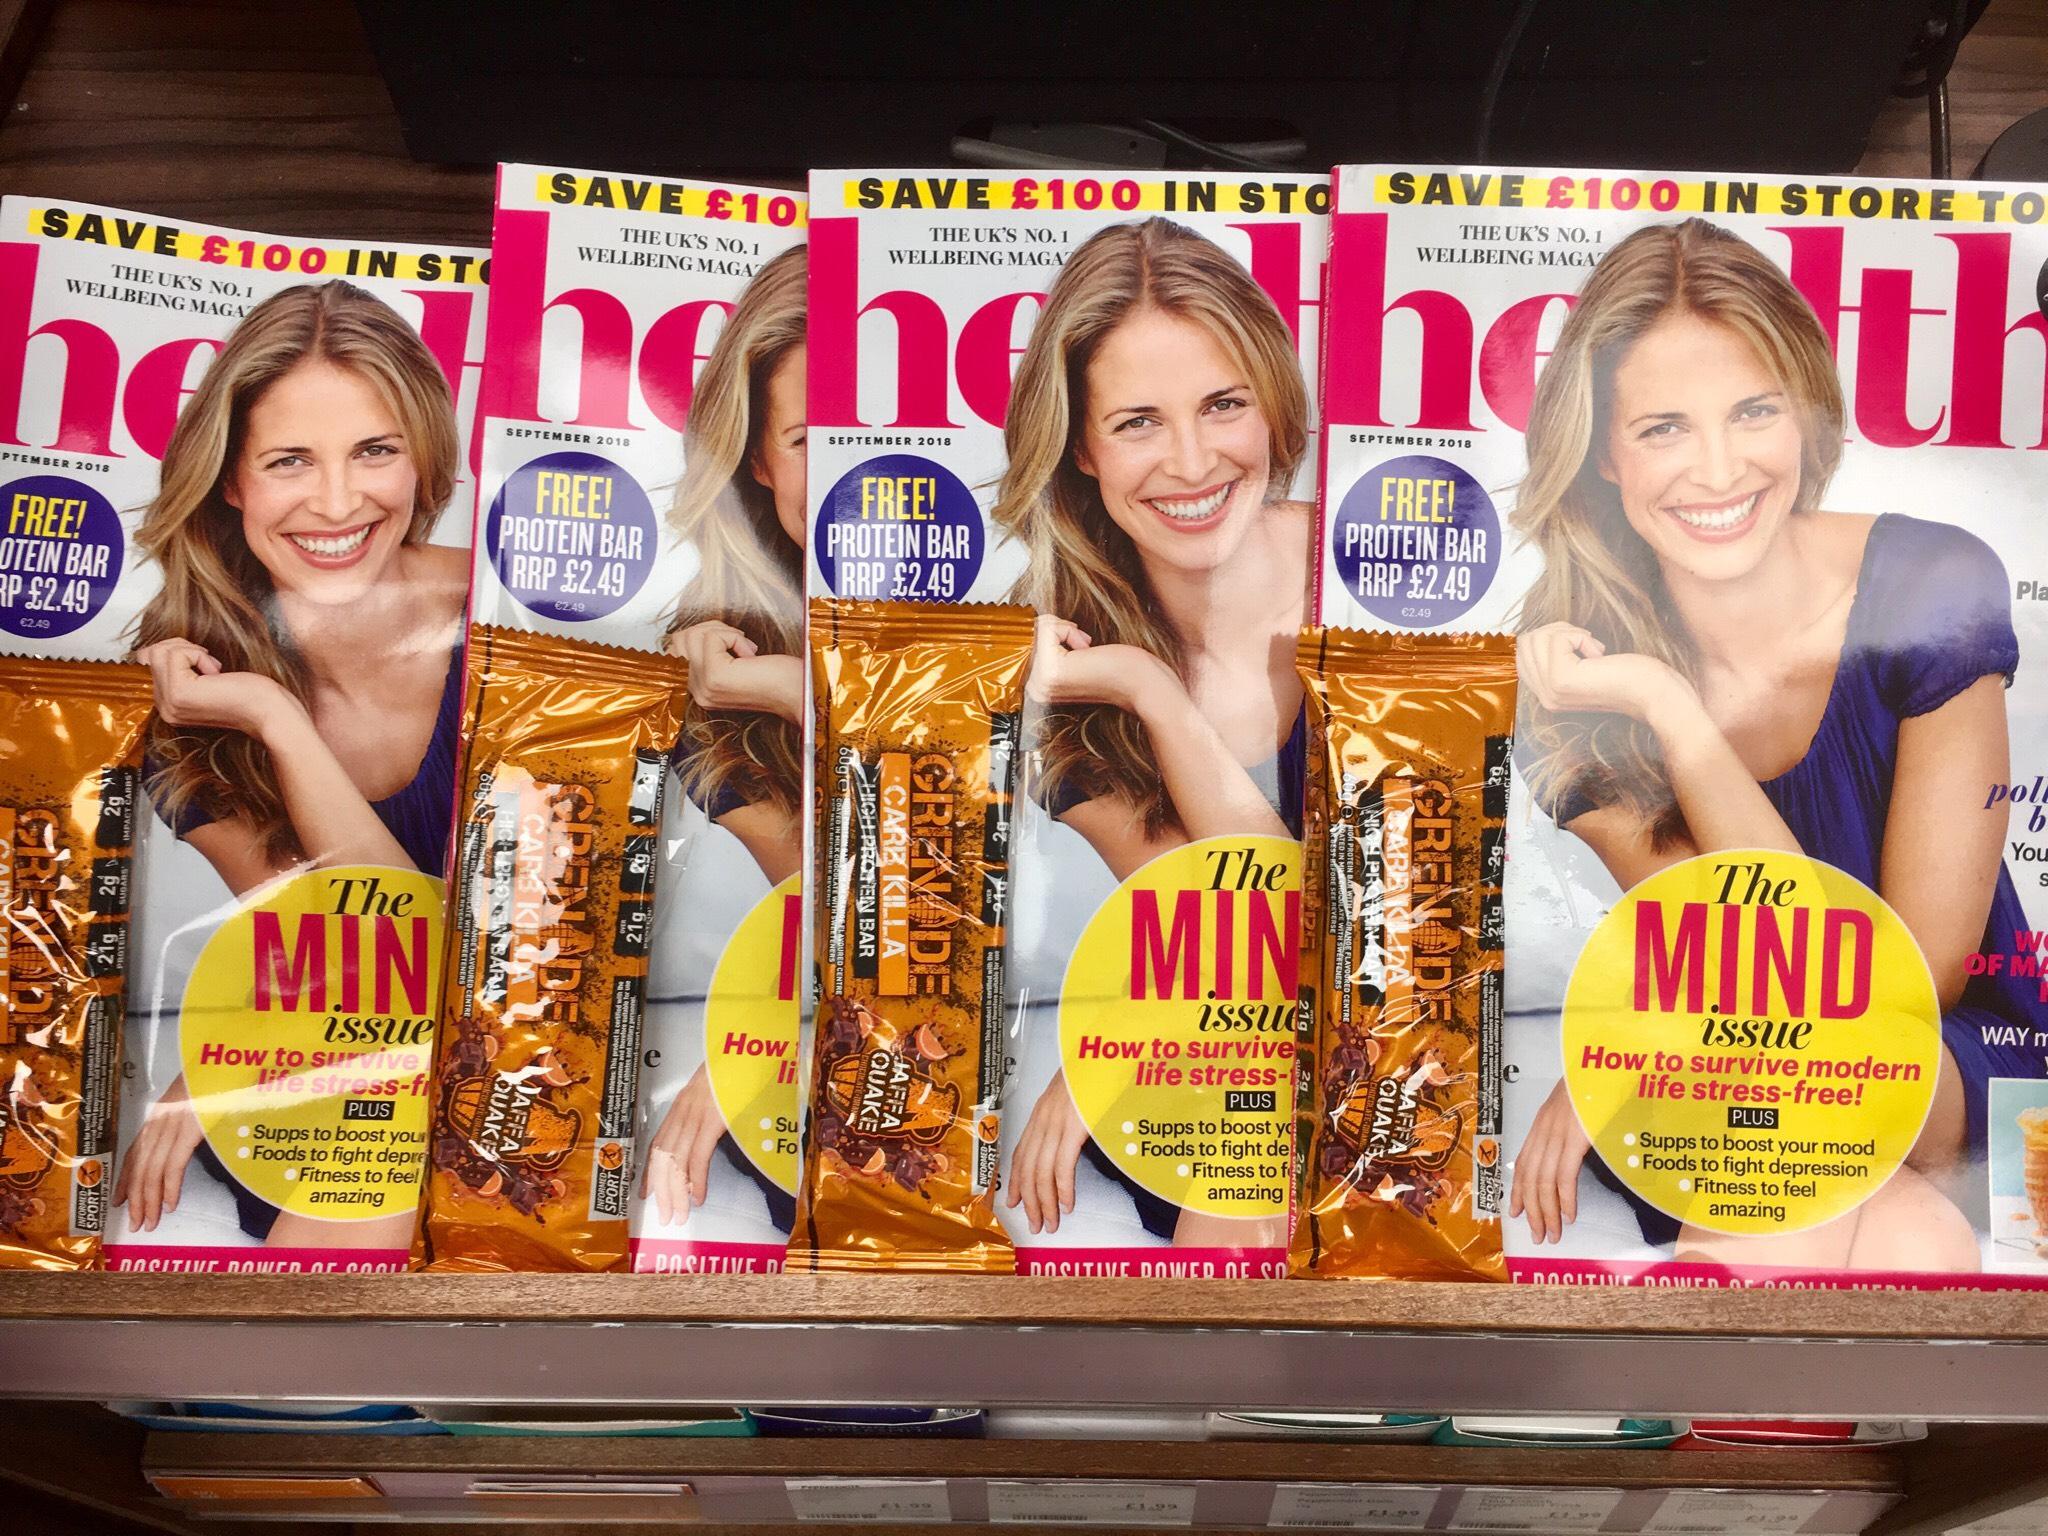 Free Grenade Bar + Loads of half Price vitamins etc coupons in Holland & Barrett Magazine £1.99